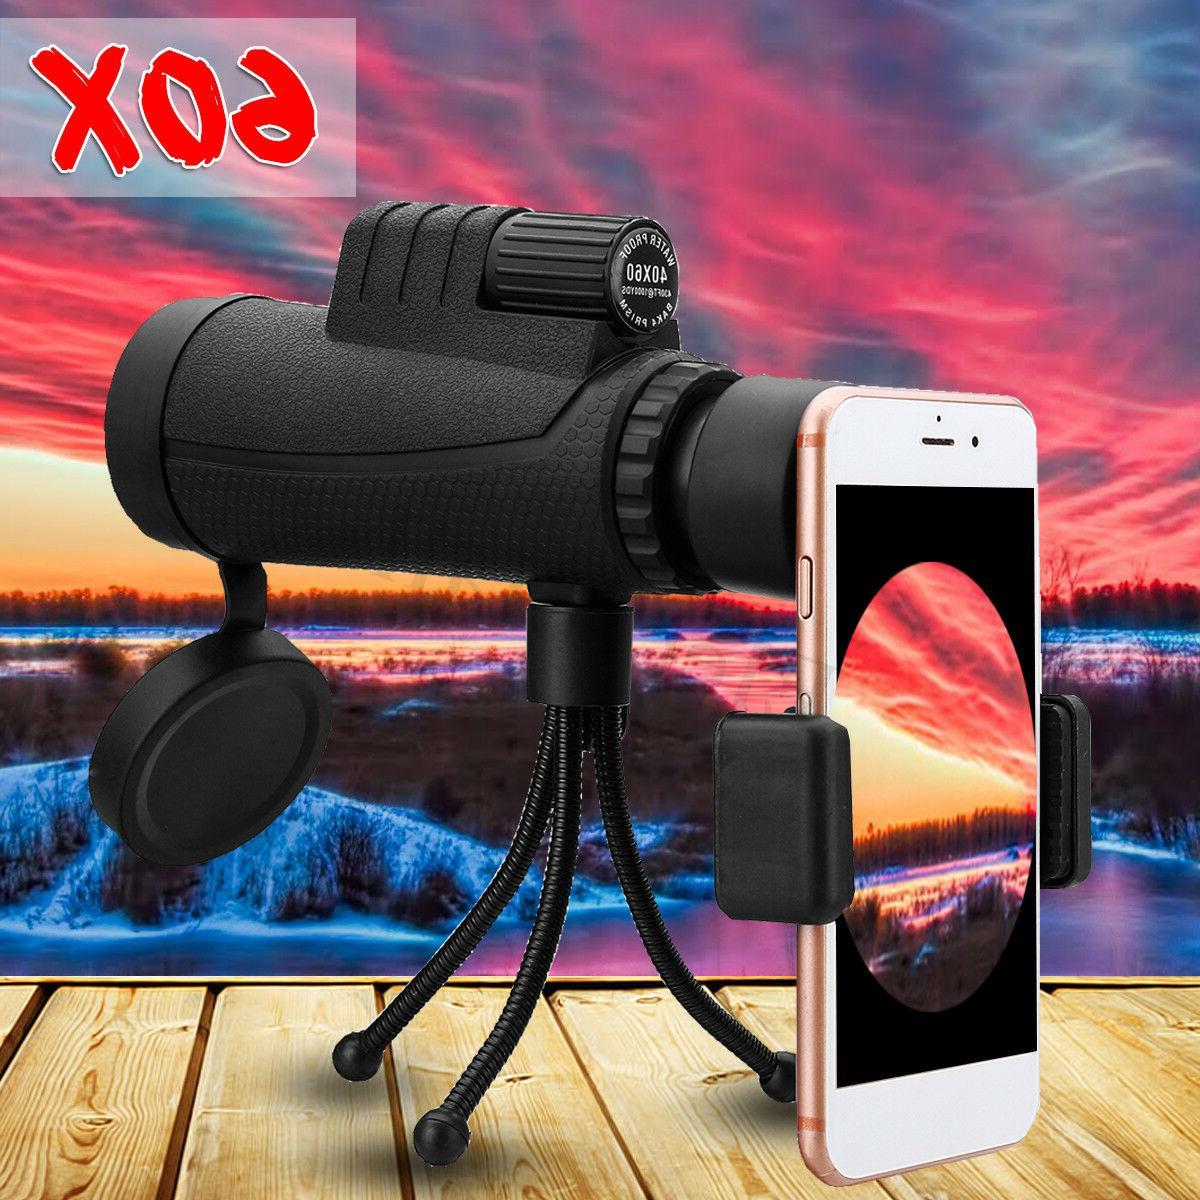 40X60 Zoom HD Optical + Tripod + for Mobile Phone